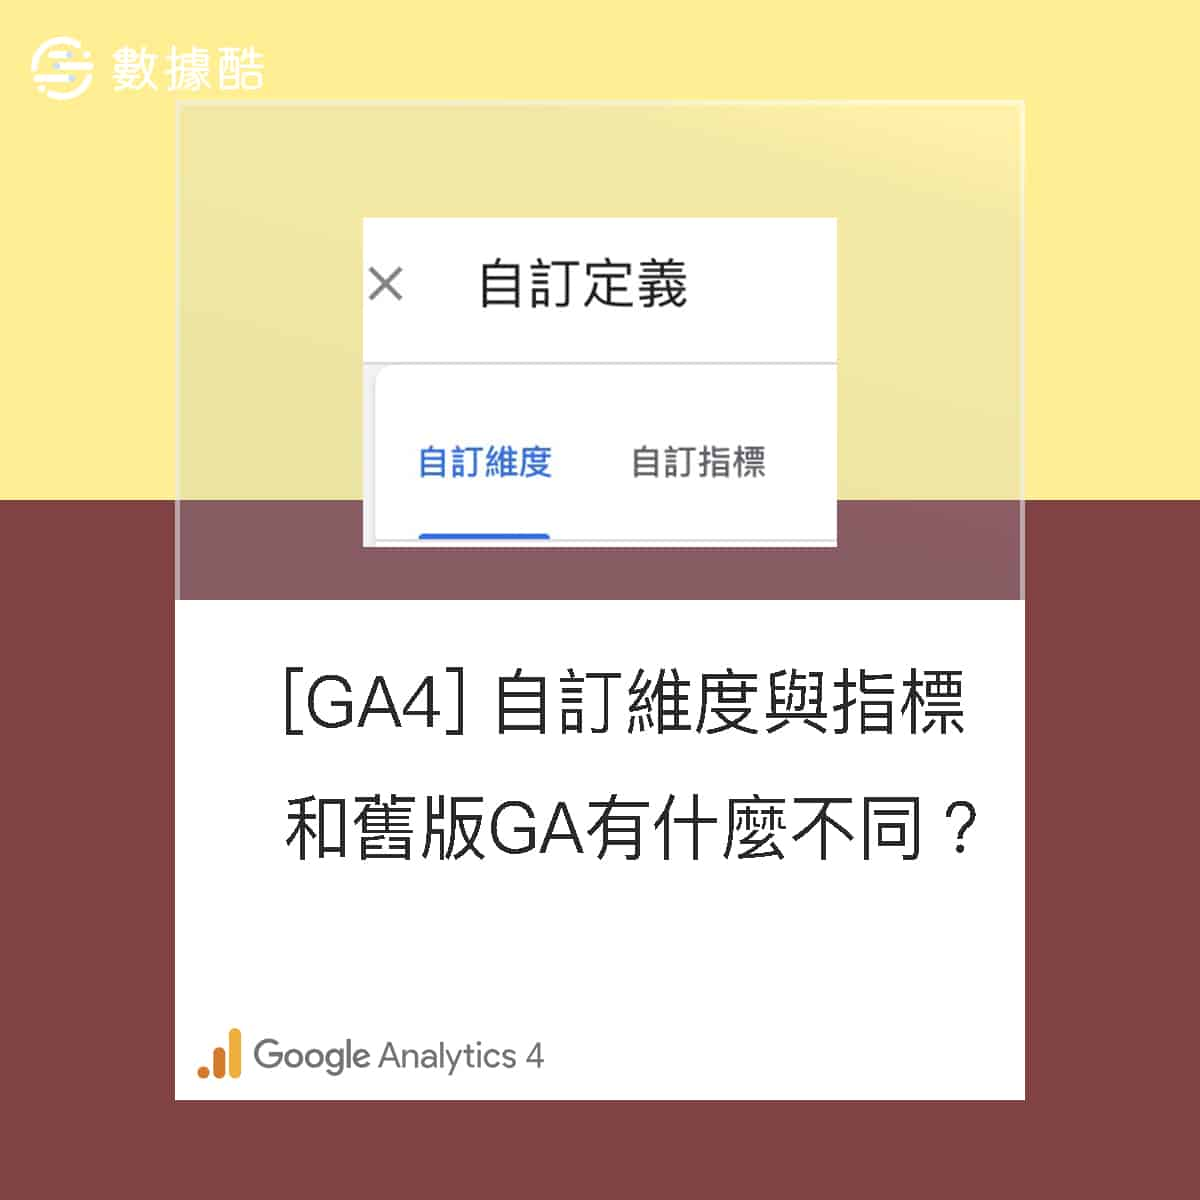 Google Analytics 4 自訂維度與指標和舊版 Google Analytics 有什麼不同?